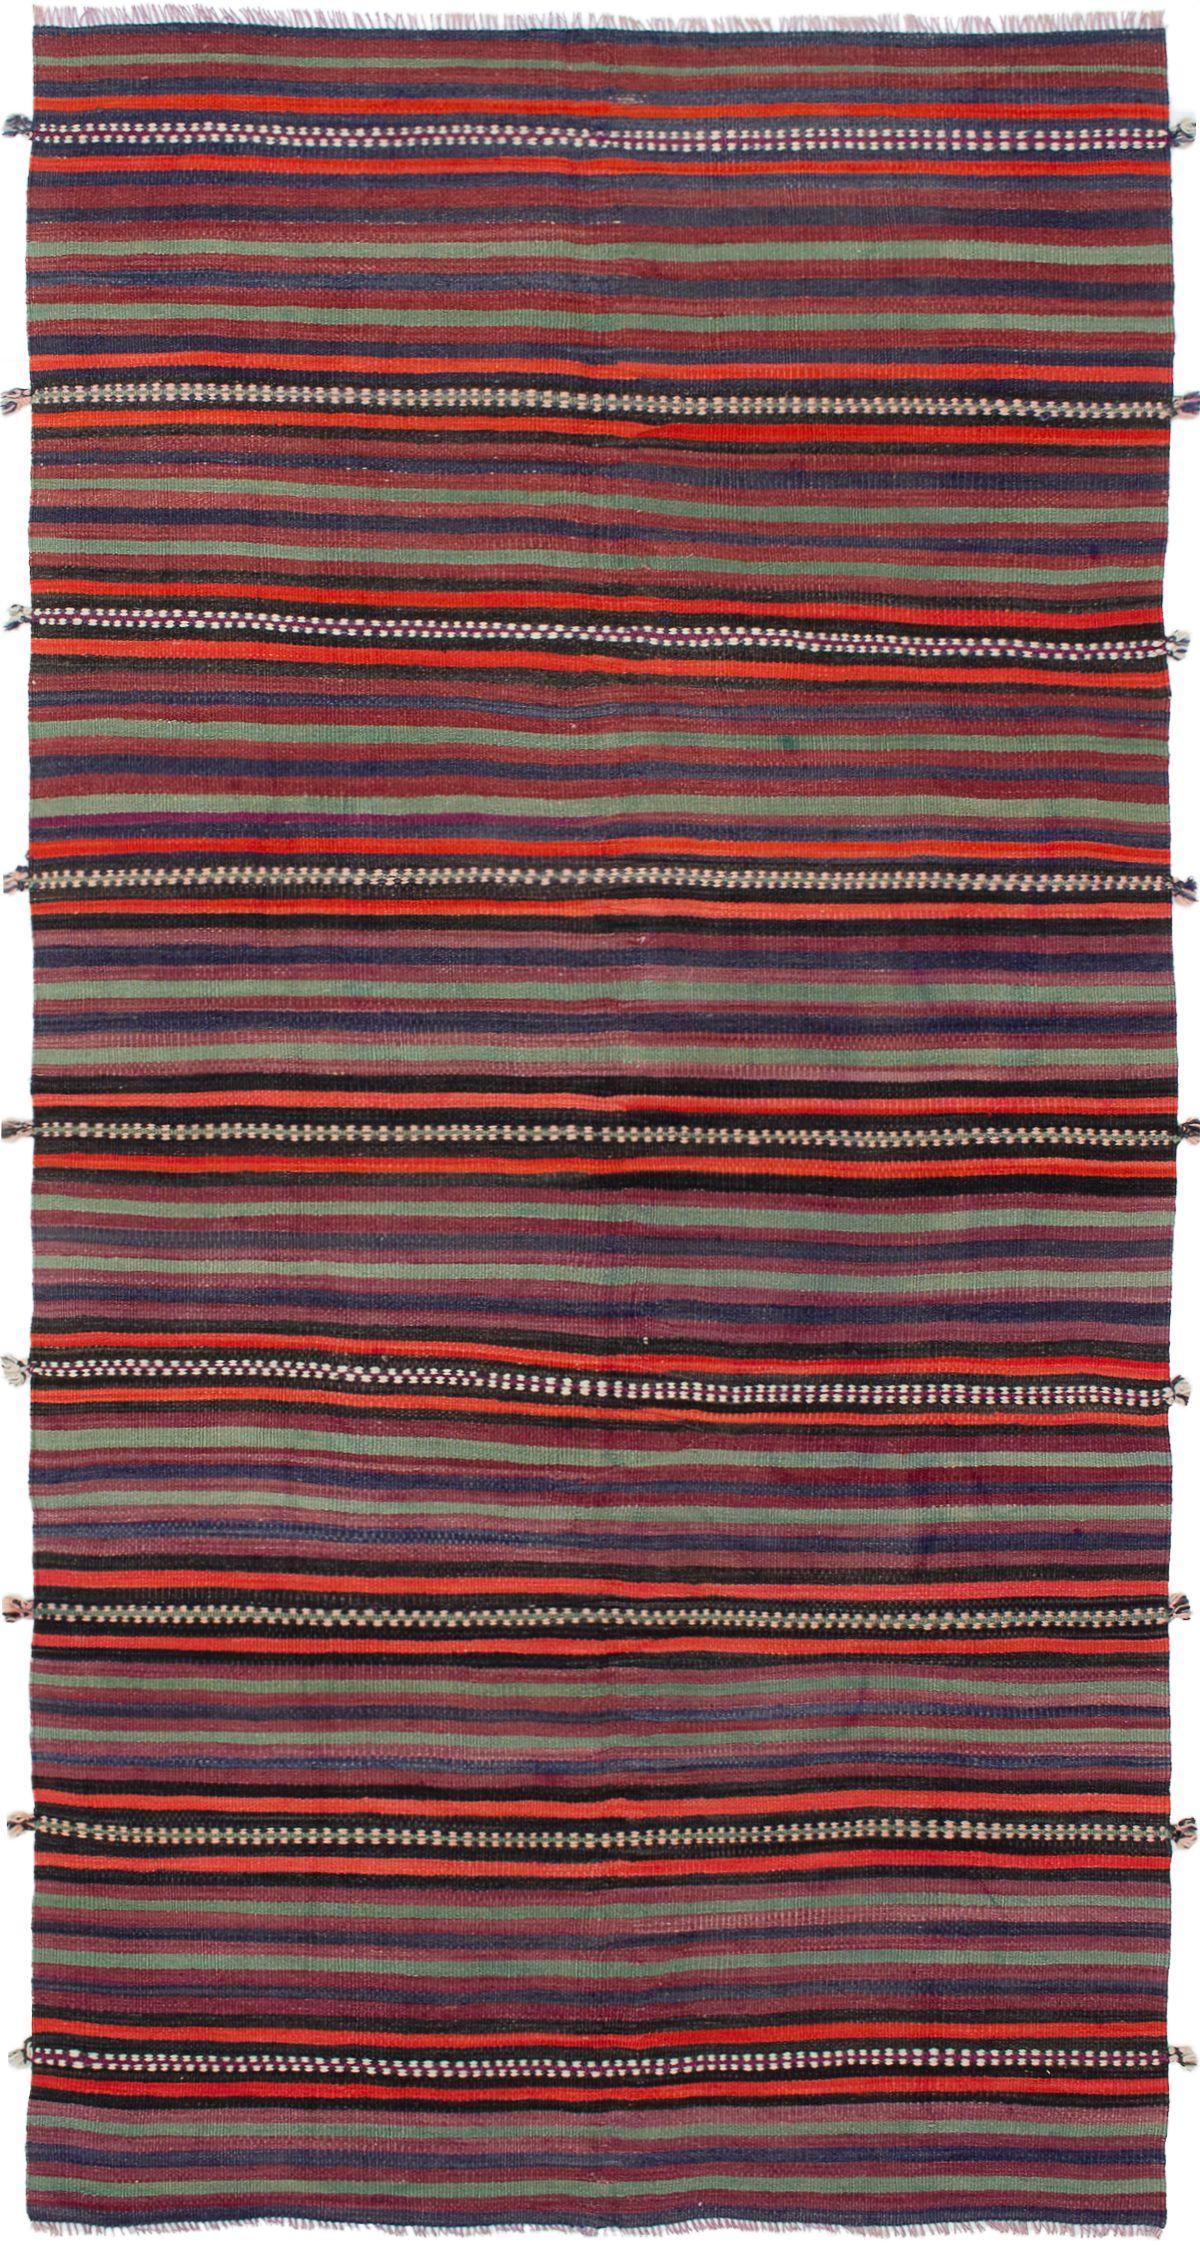 "Hand woven Bohemian Red Wool Kilim 4'11"" x 9'10"" Size: 4'11"" x 9'10"""